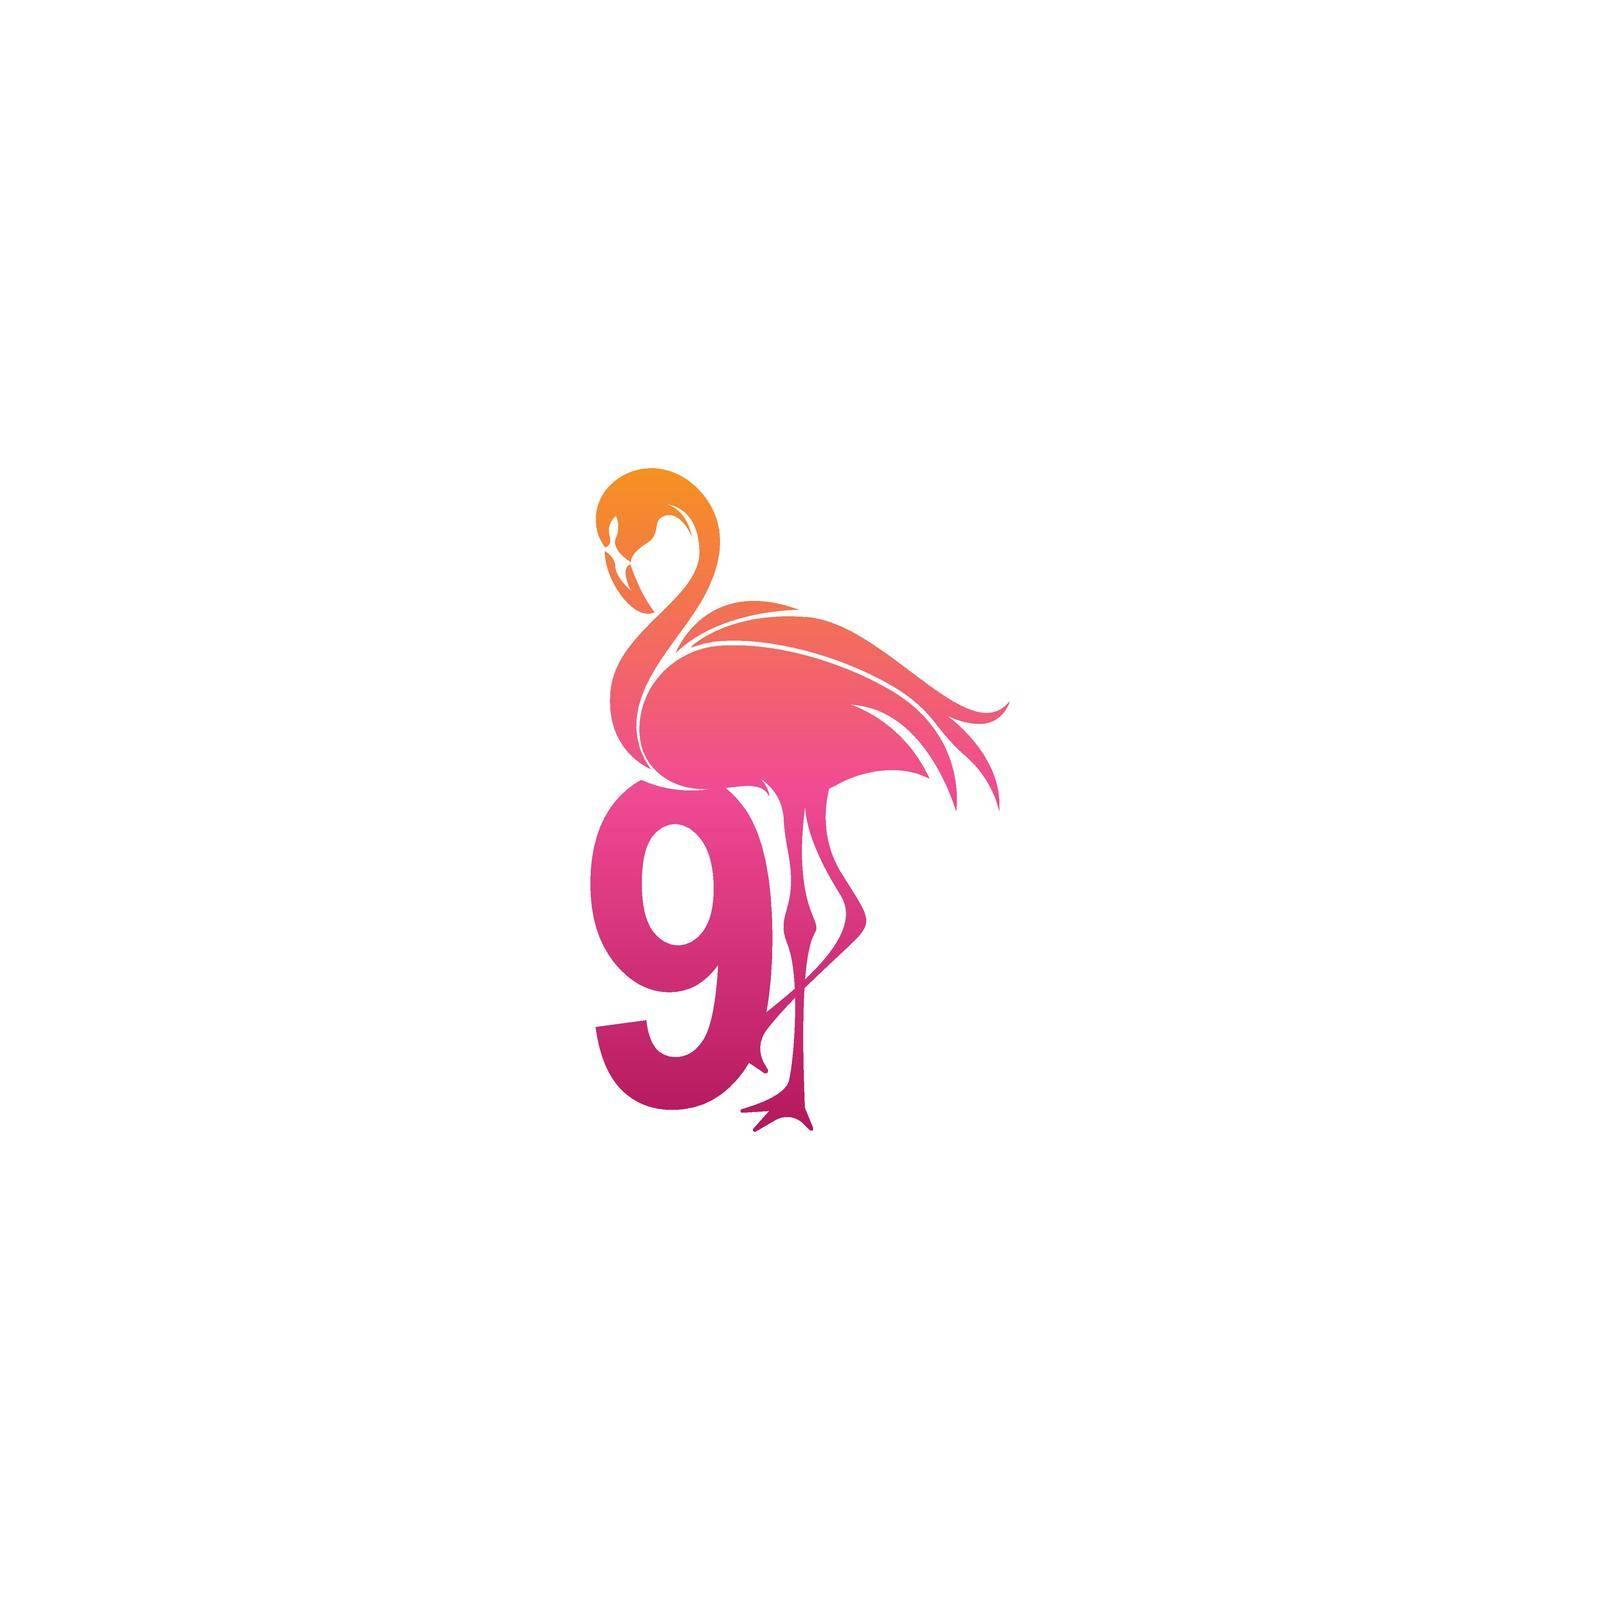 Flamingo bird icon with Number 9 Logo design vector template